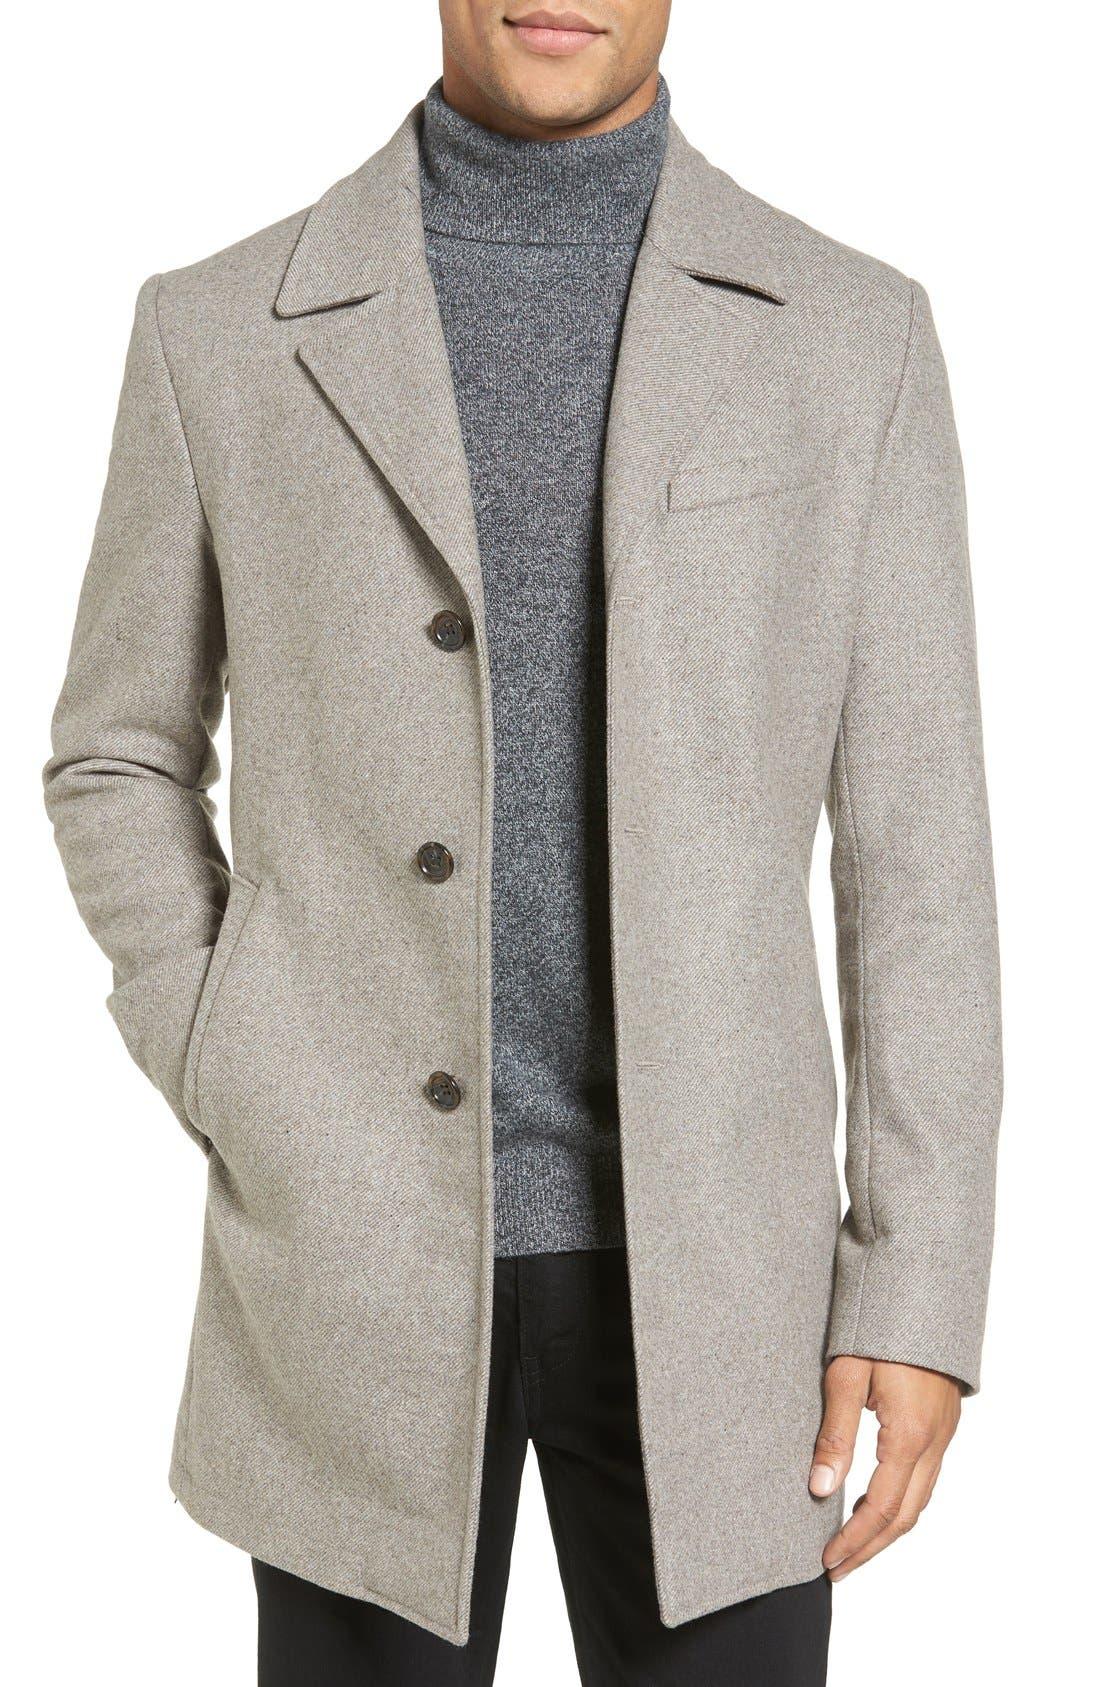 Michael Kors Slim Fit Wool Blend Top Coat